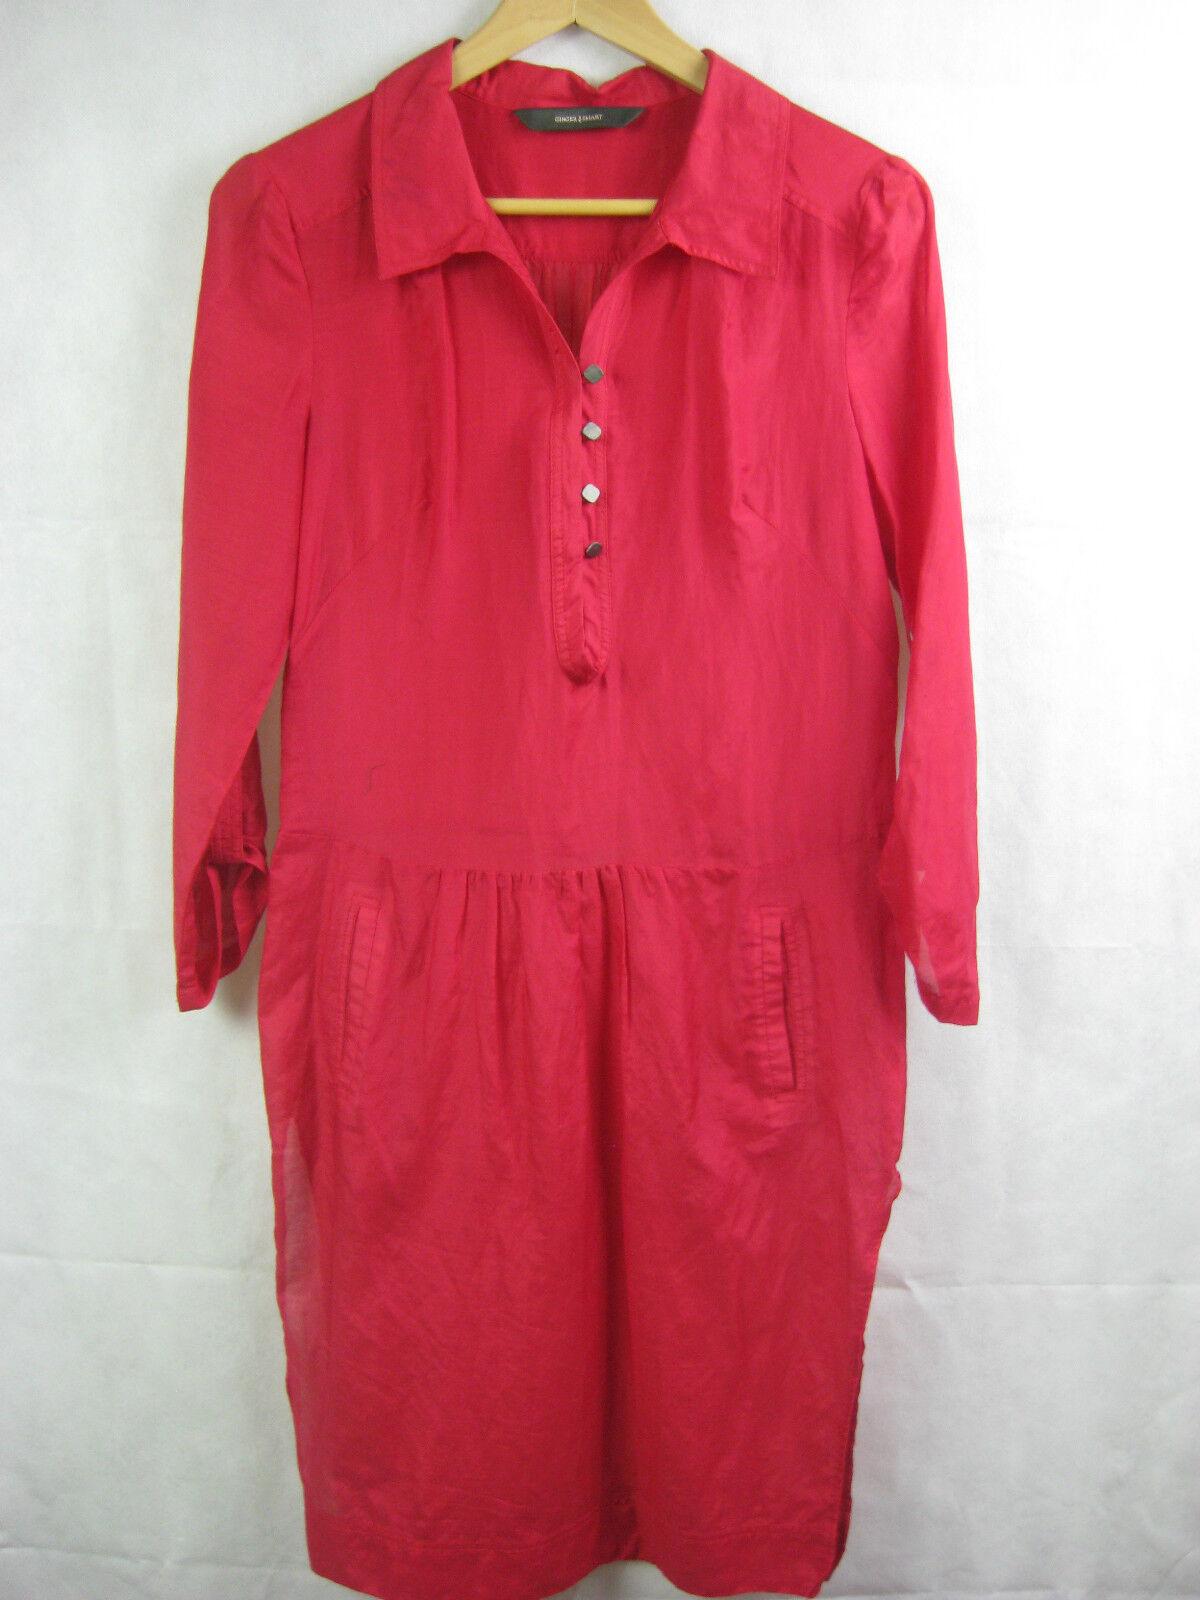 Ginger & Smart Size 8 Crimson Red Shirt Dress